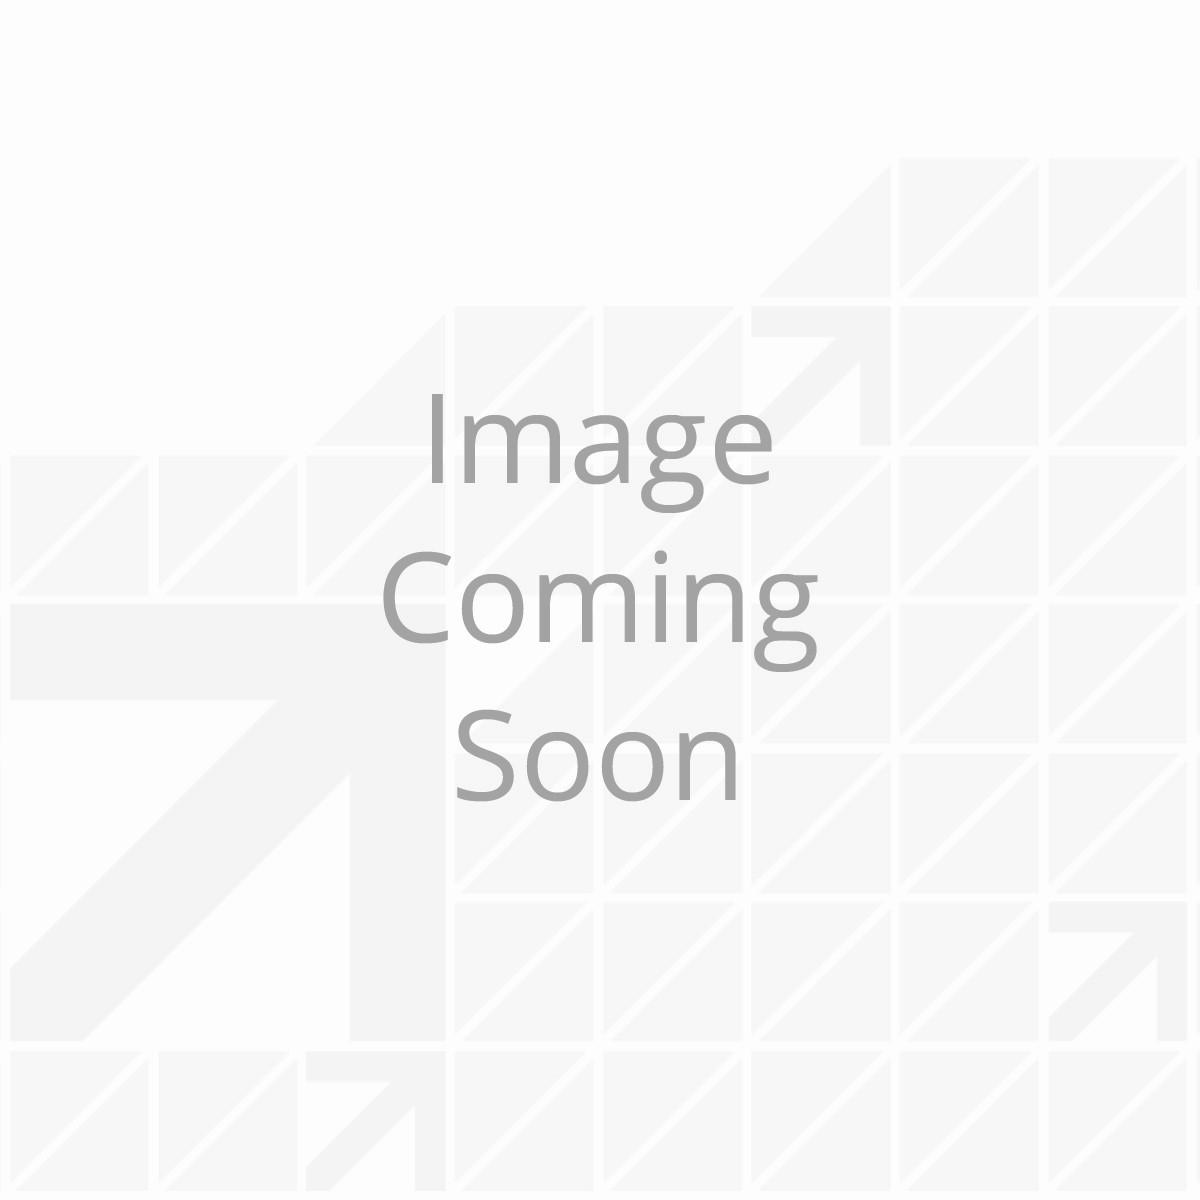 359218_-_pg_leveling_control_kit_-_001_1